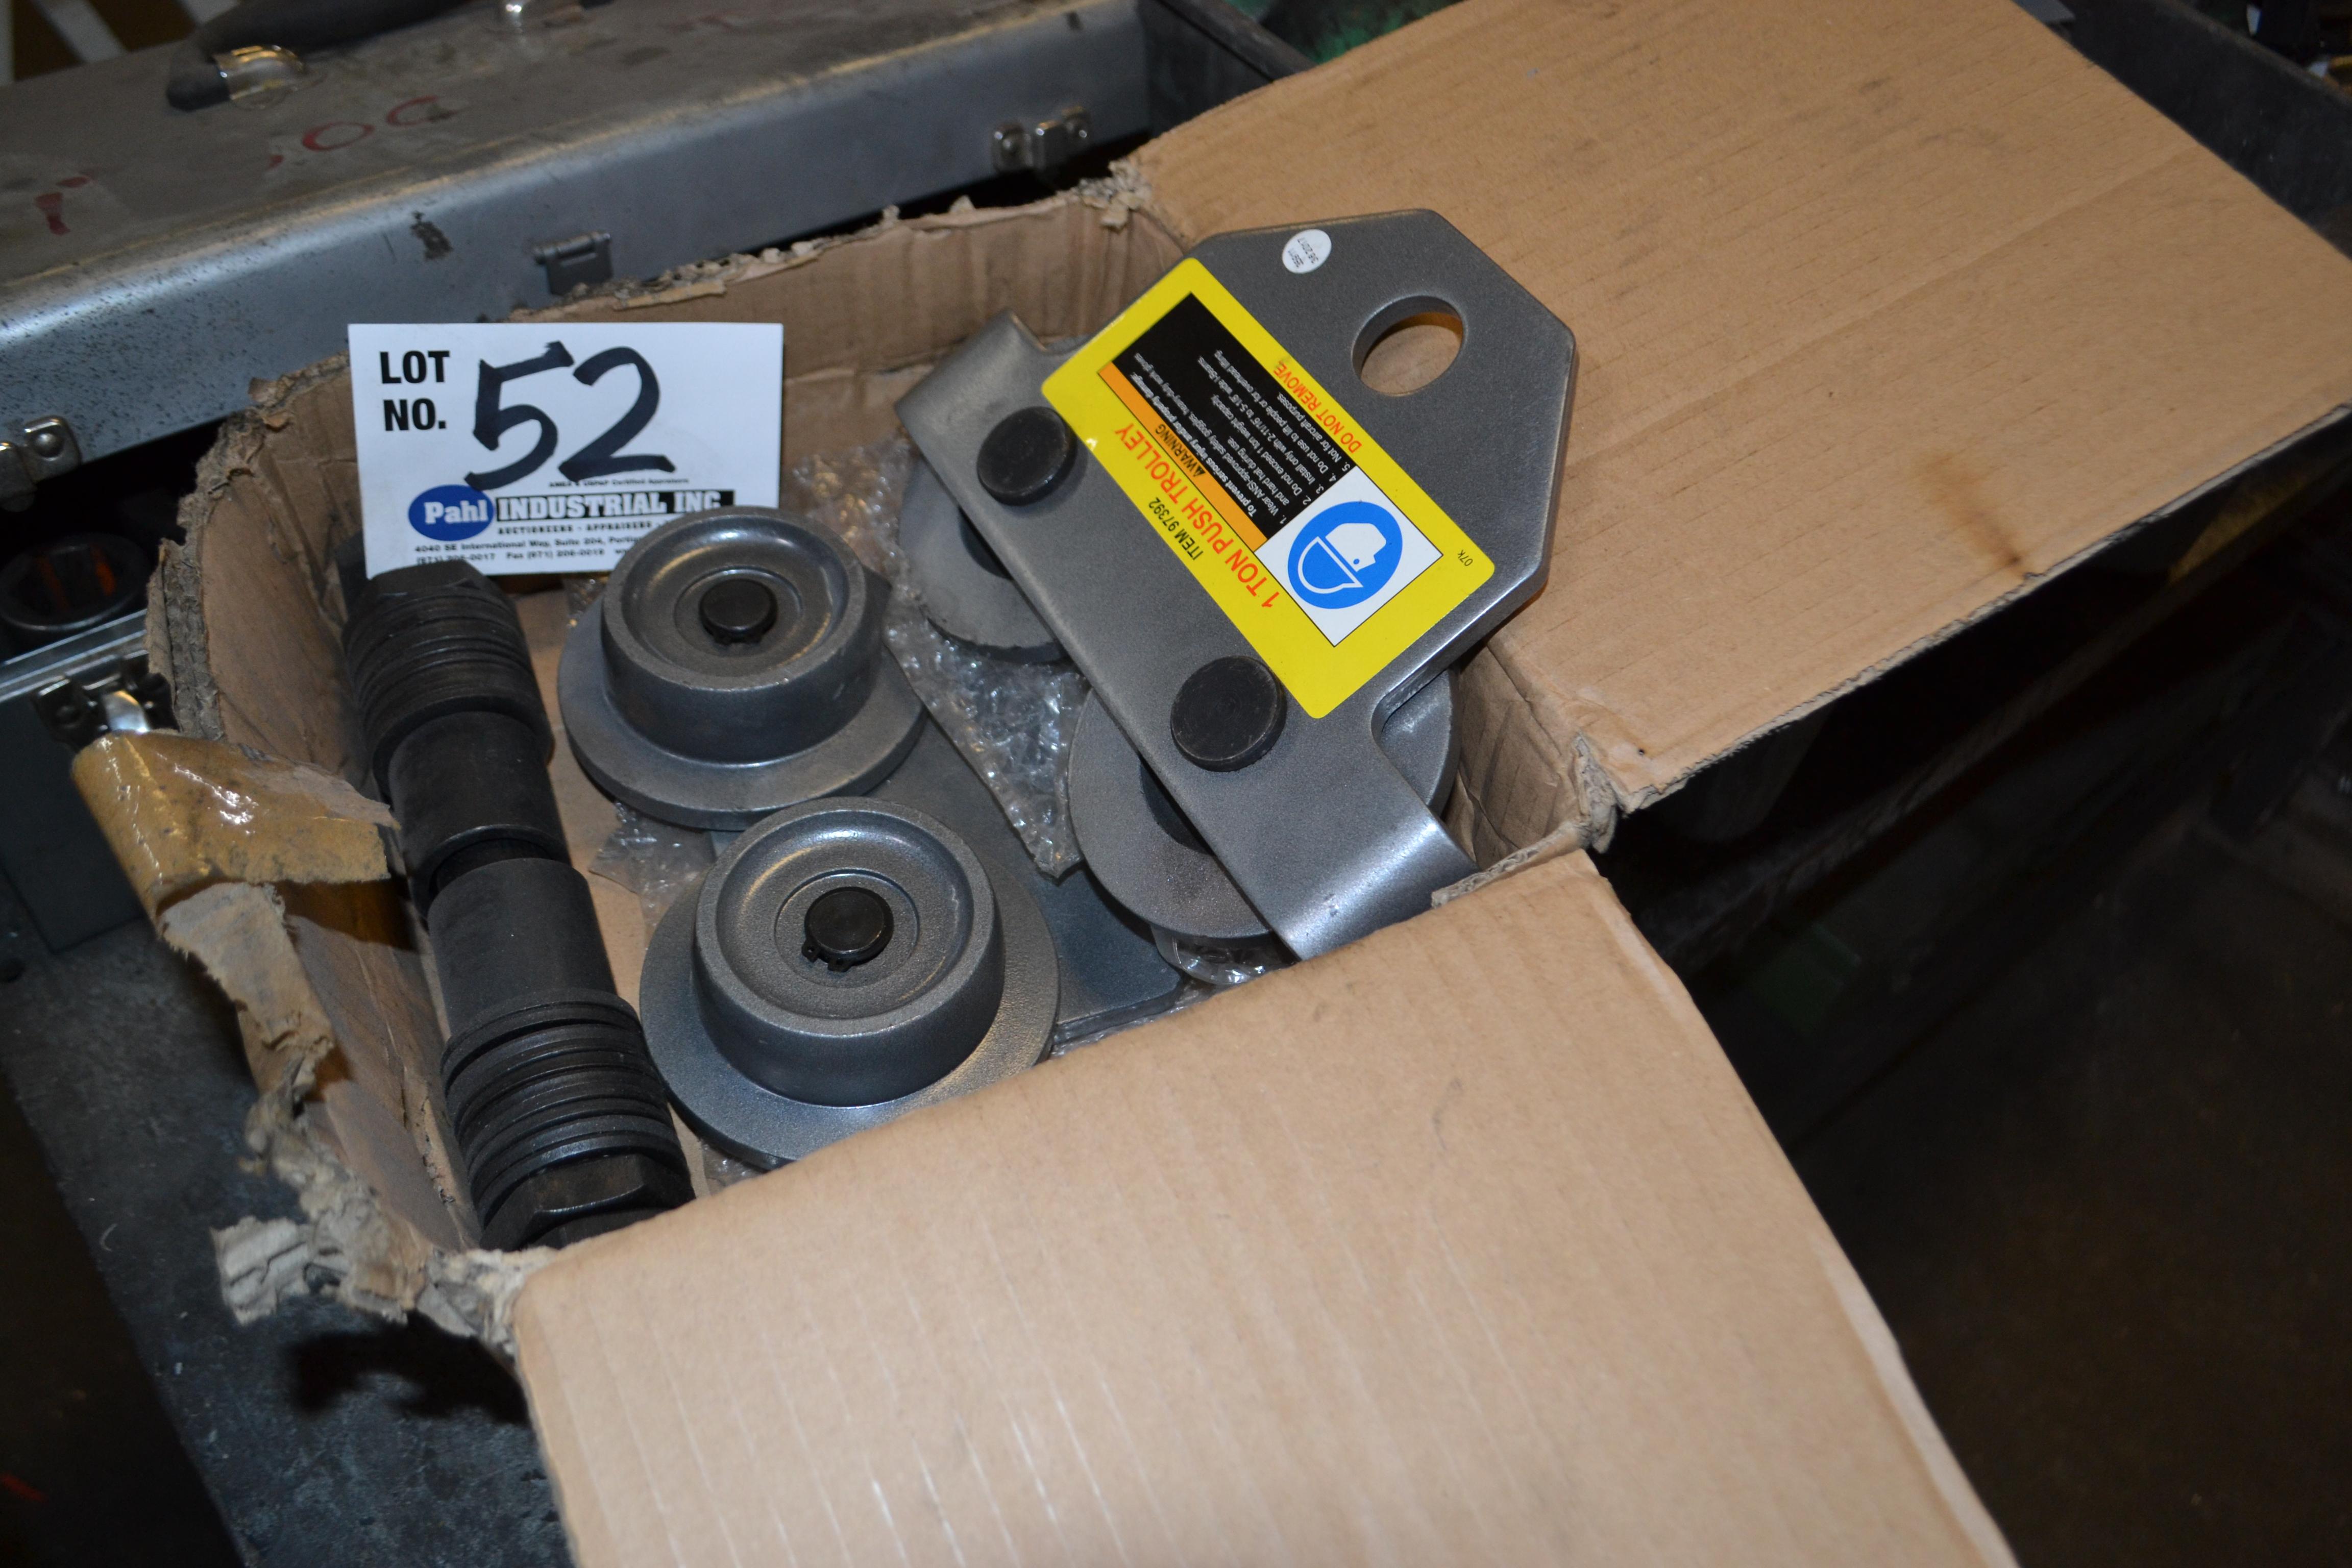 Lot 52 - 1-Ton Push Trolley Kit New In Box